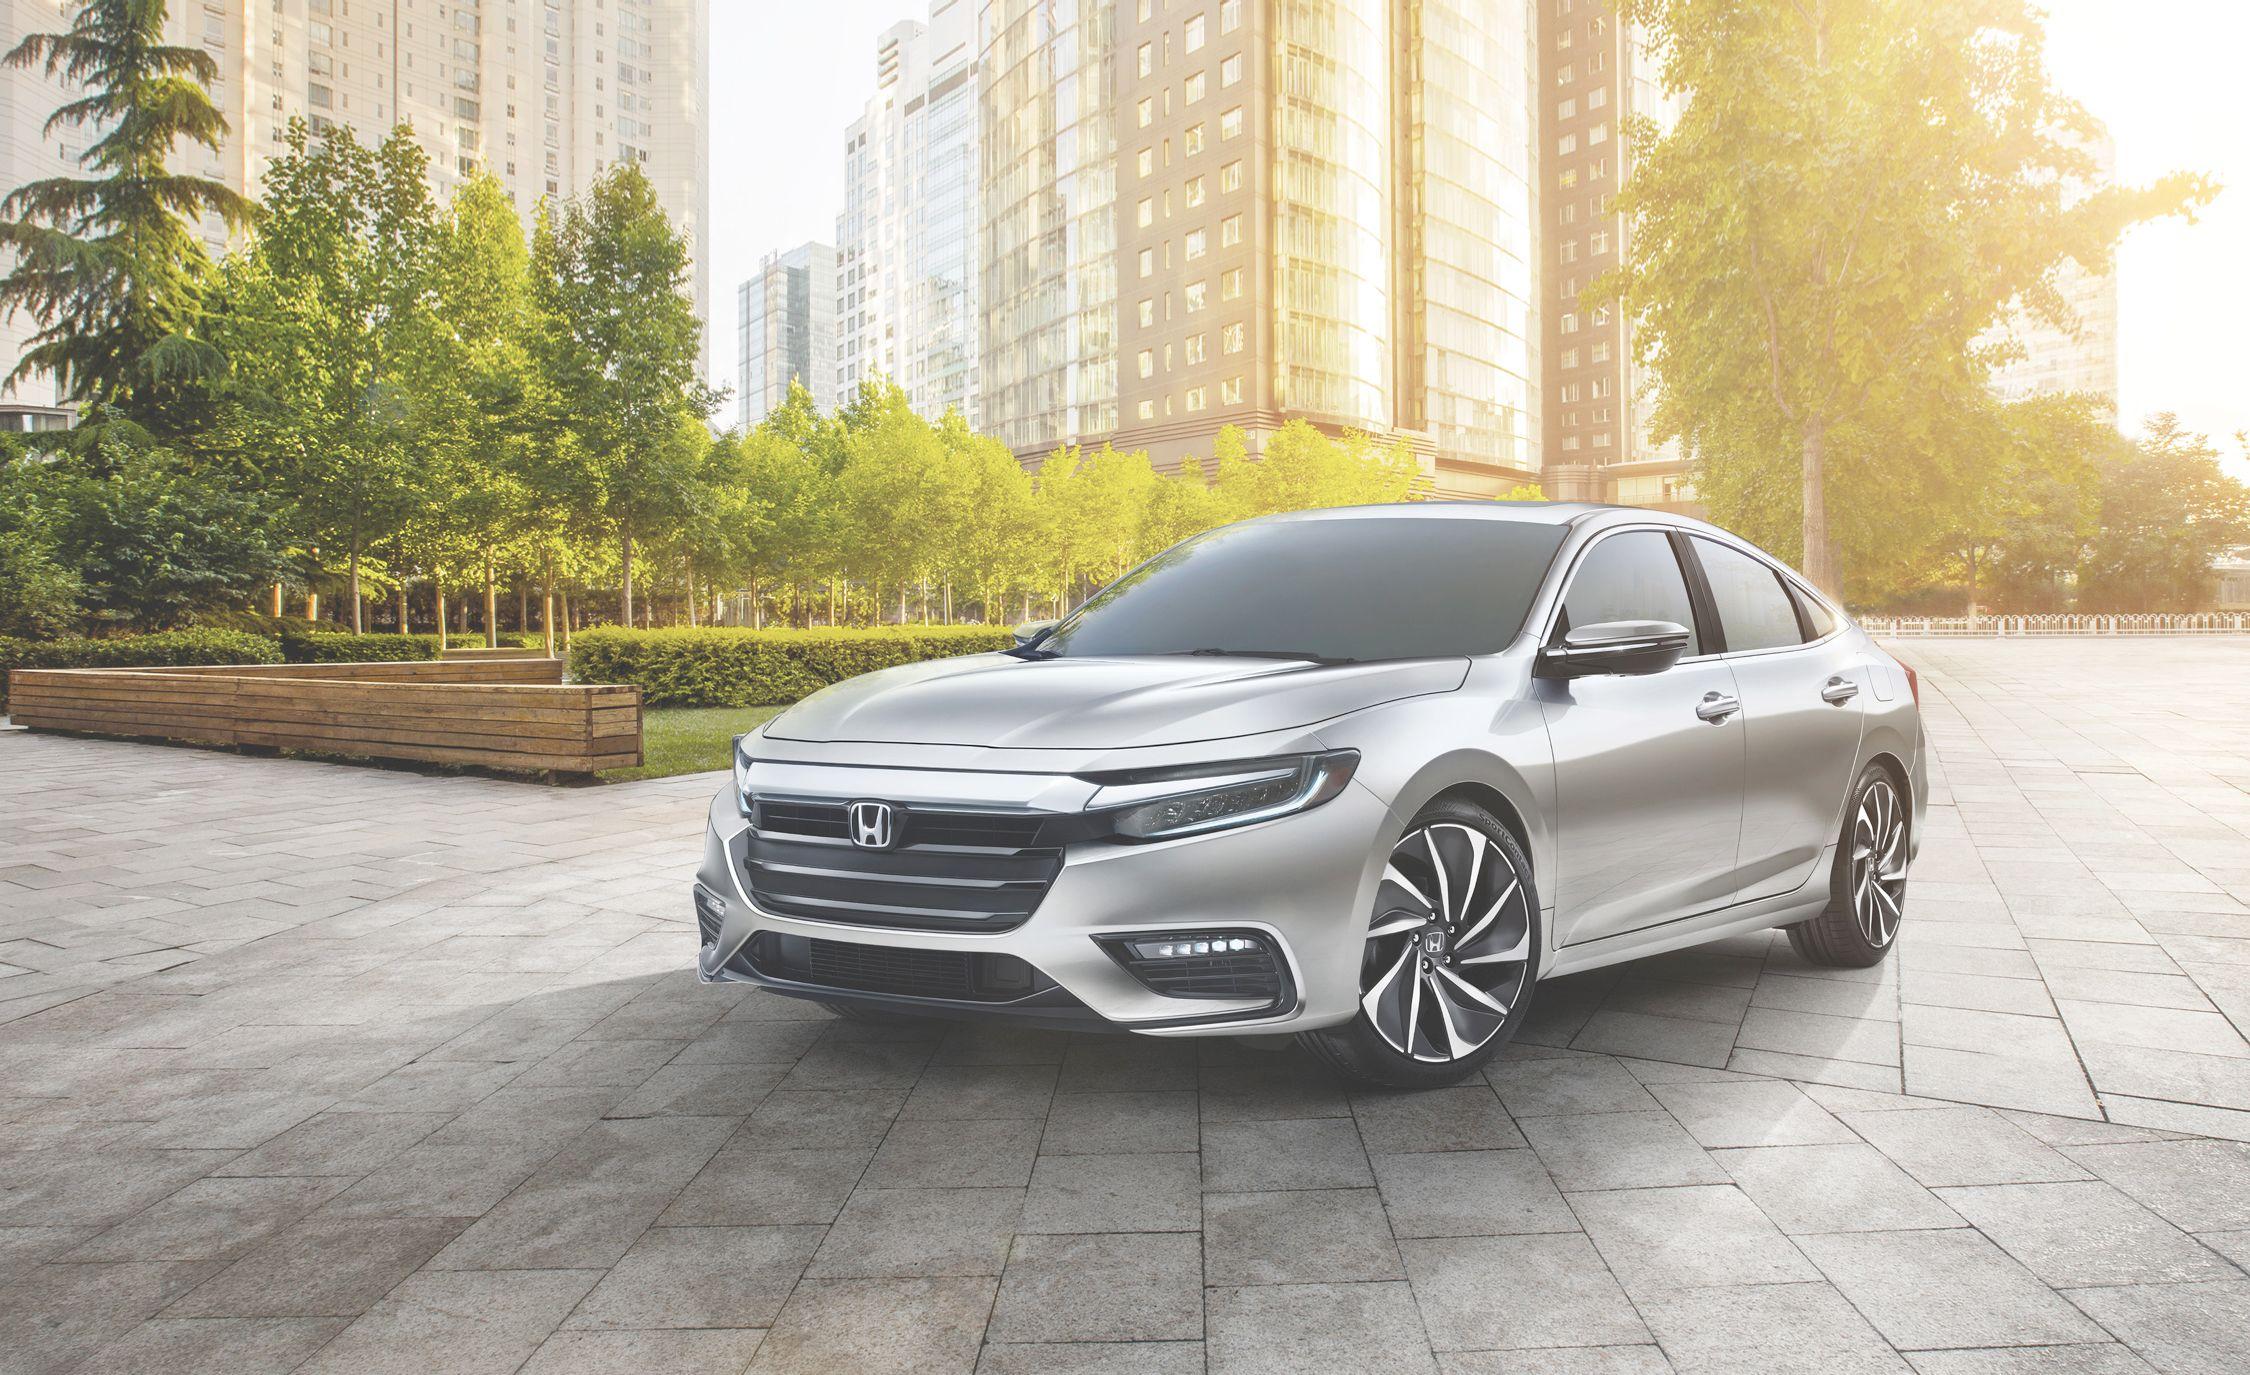 2019 Honda Insight Prototype Pictures | Photo Gallery ...